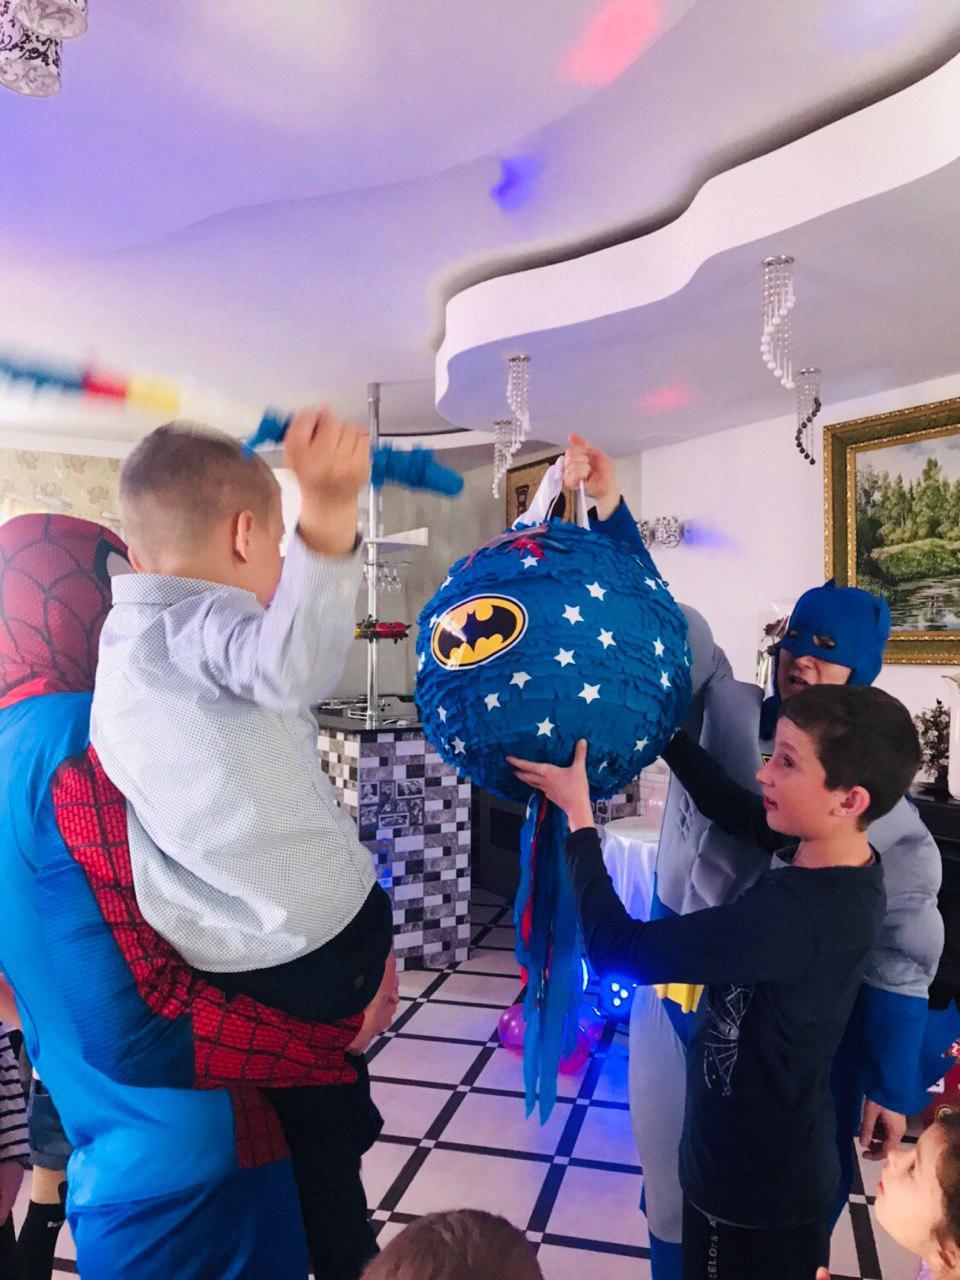 Бэтмен и Спайдермен 11 ивент агентство Птица Днепр